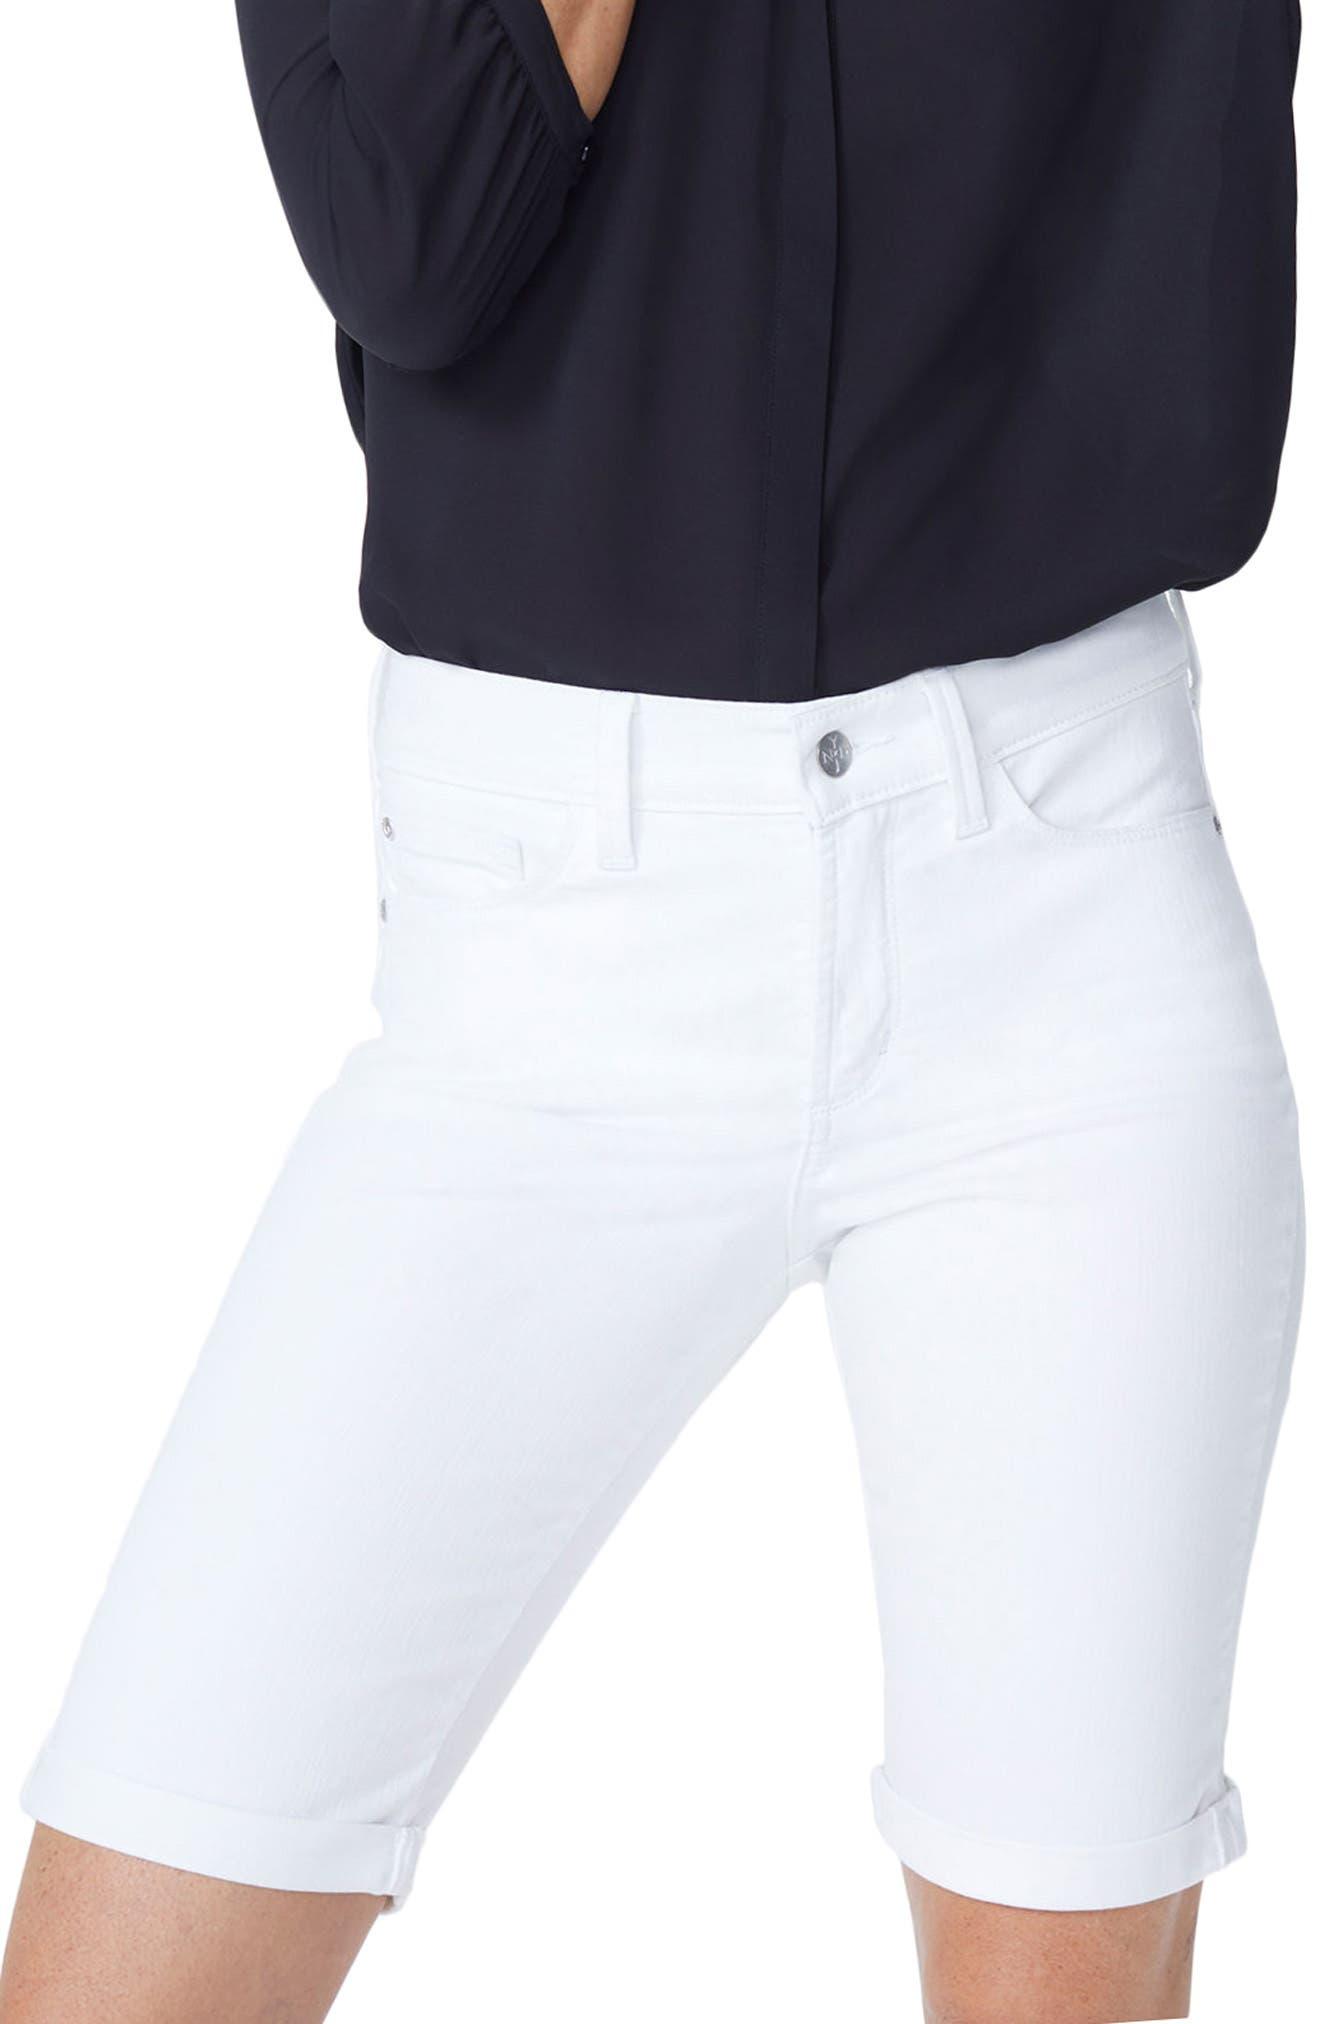 Alternate Image 1 Selected - NYDJ Briella Roll Cuff Bermuda Shorts